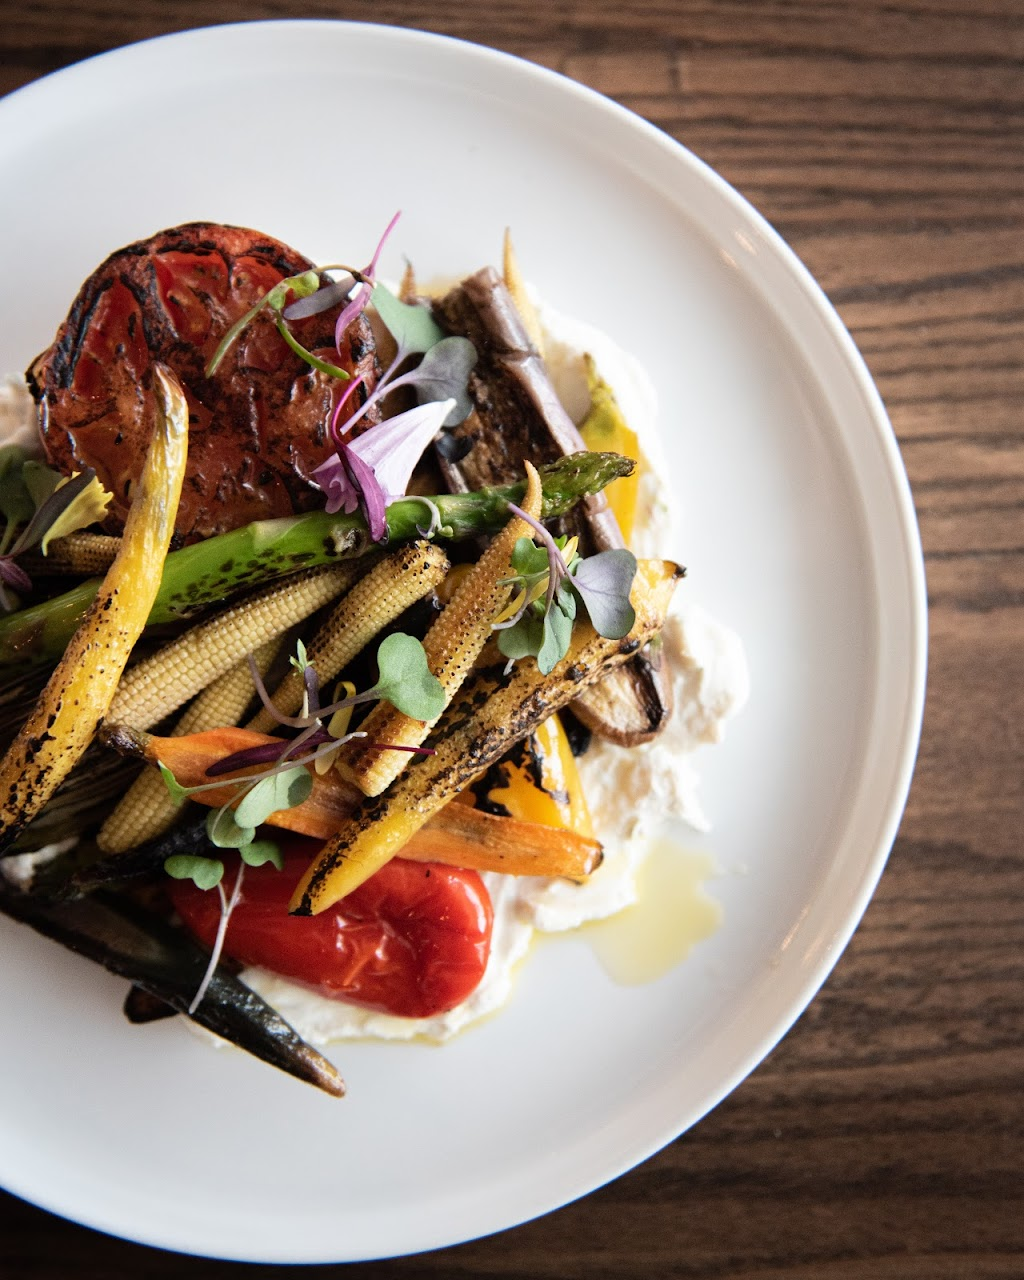 Lettuce & Tomato Market + Eatery | restaurant | 13408 Biscayne Blvd, Miami, FL 33181, USA | 3057602260 OR +1 305-760-2260